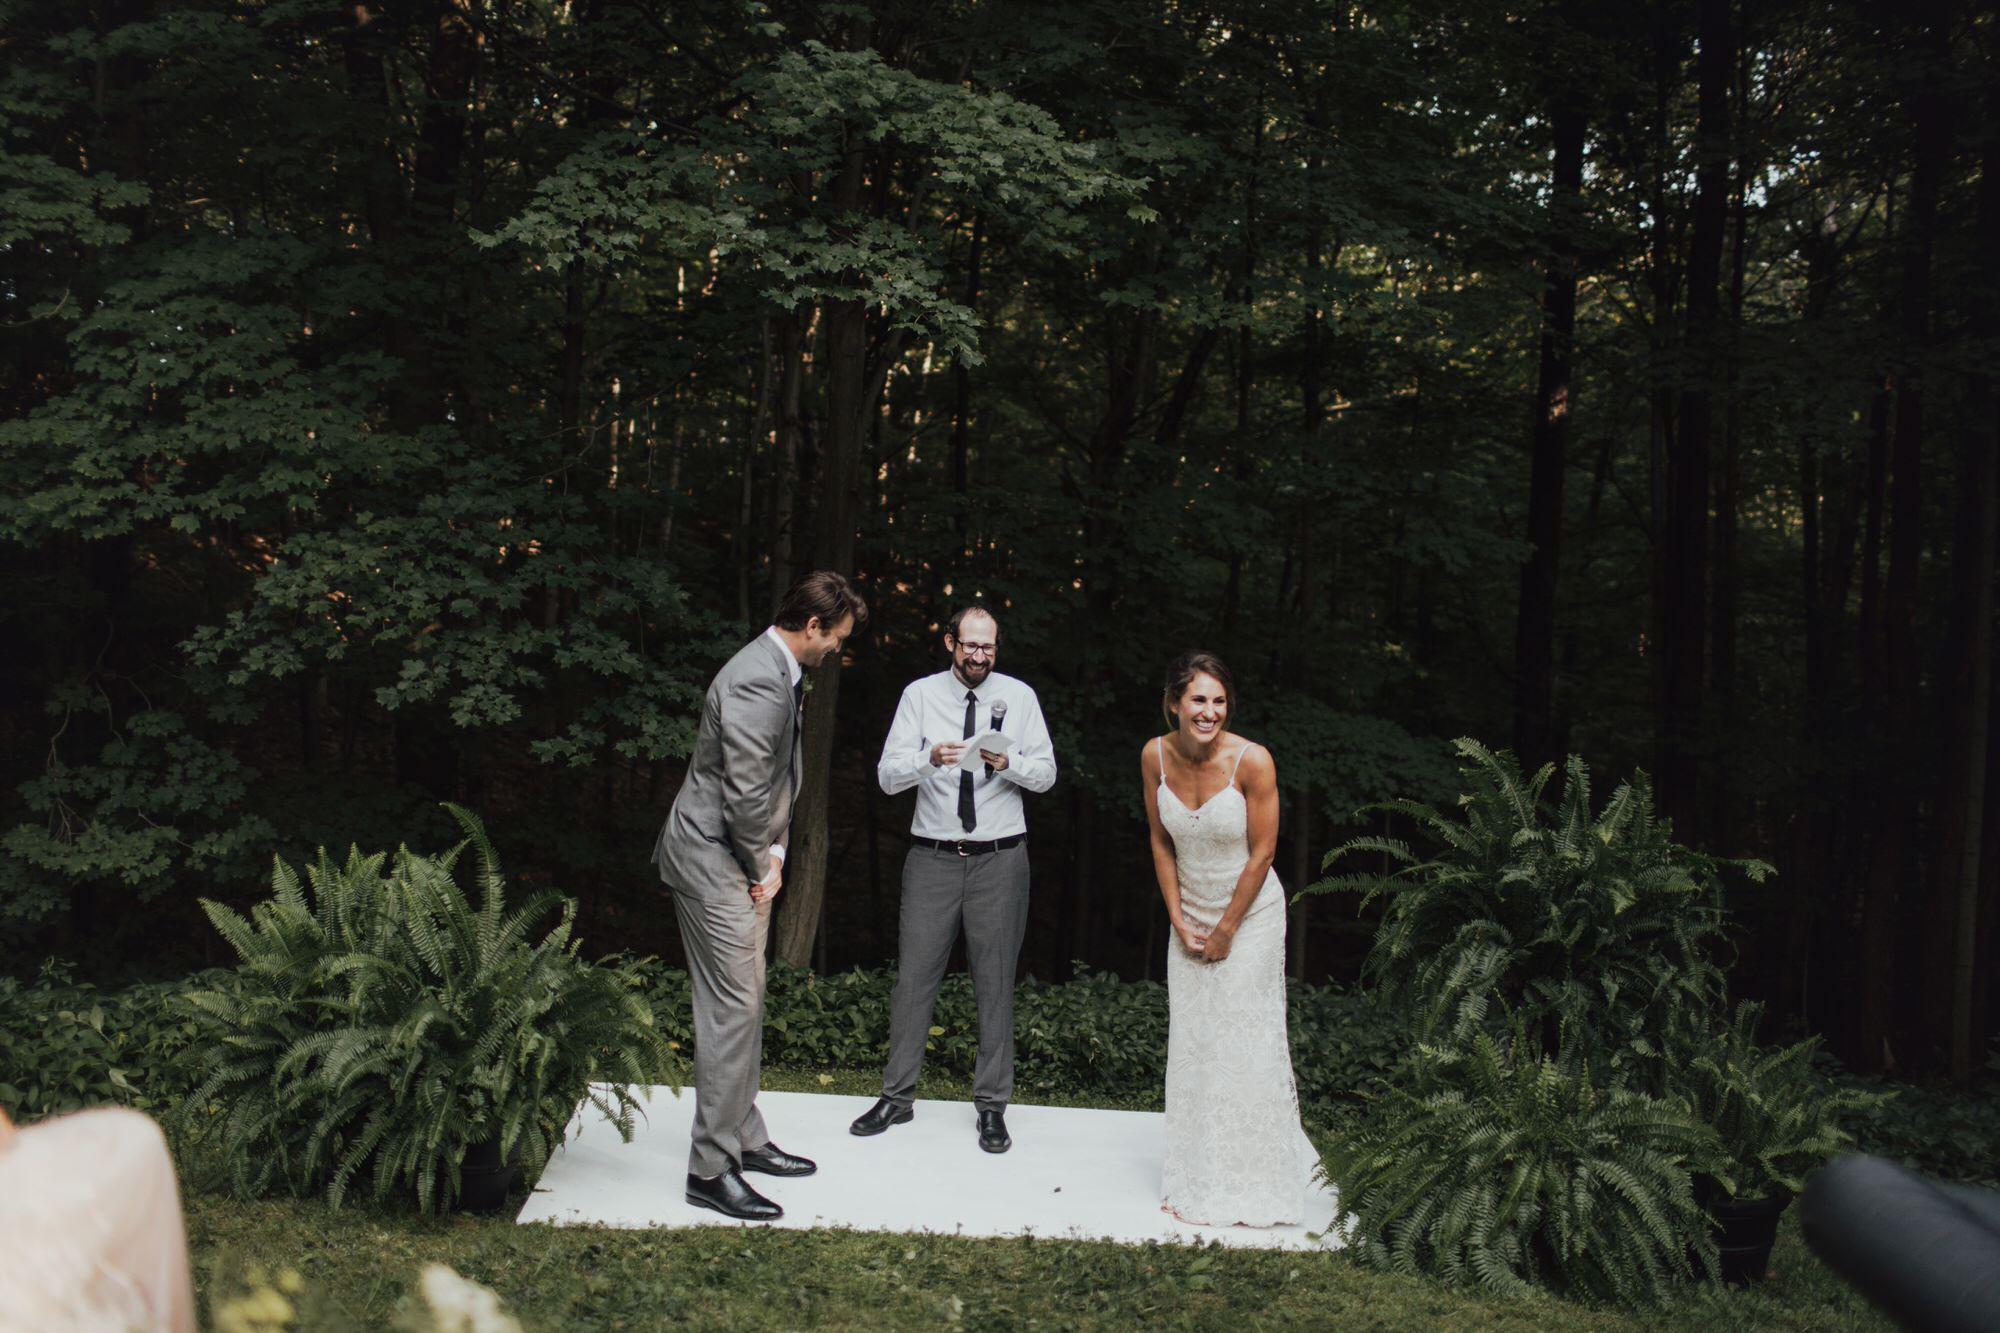 emily-aaron-rochester-new-york-wedding-photographer-66.JPG